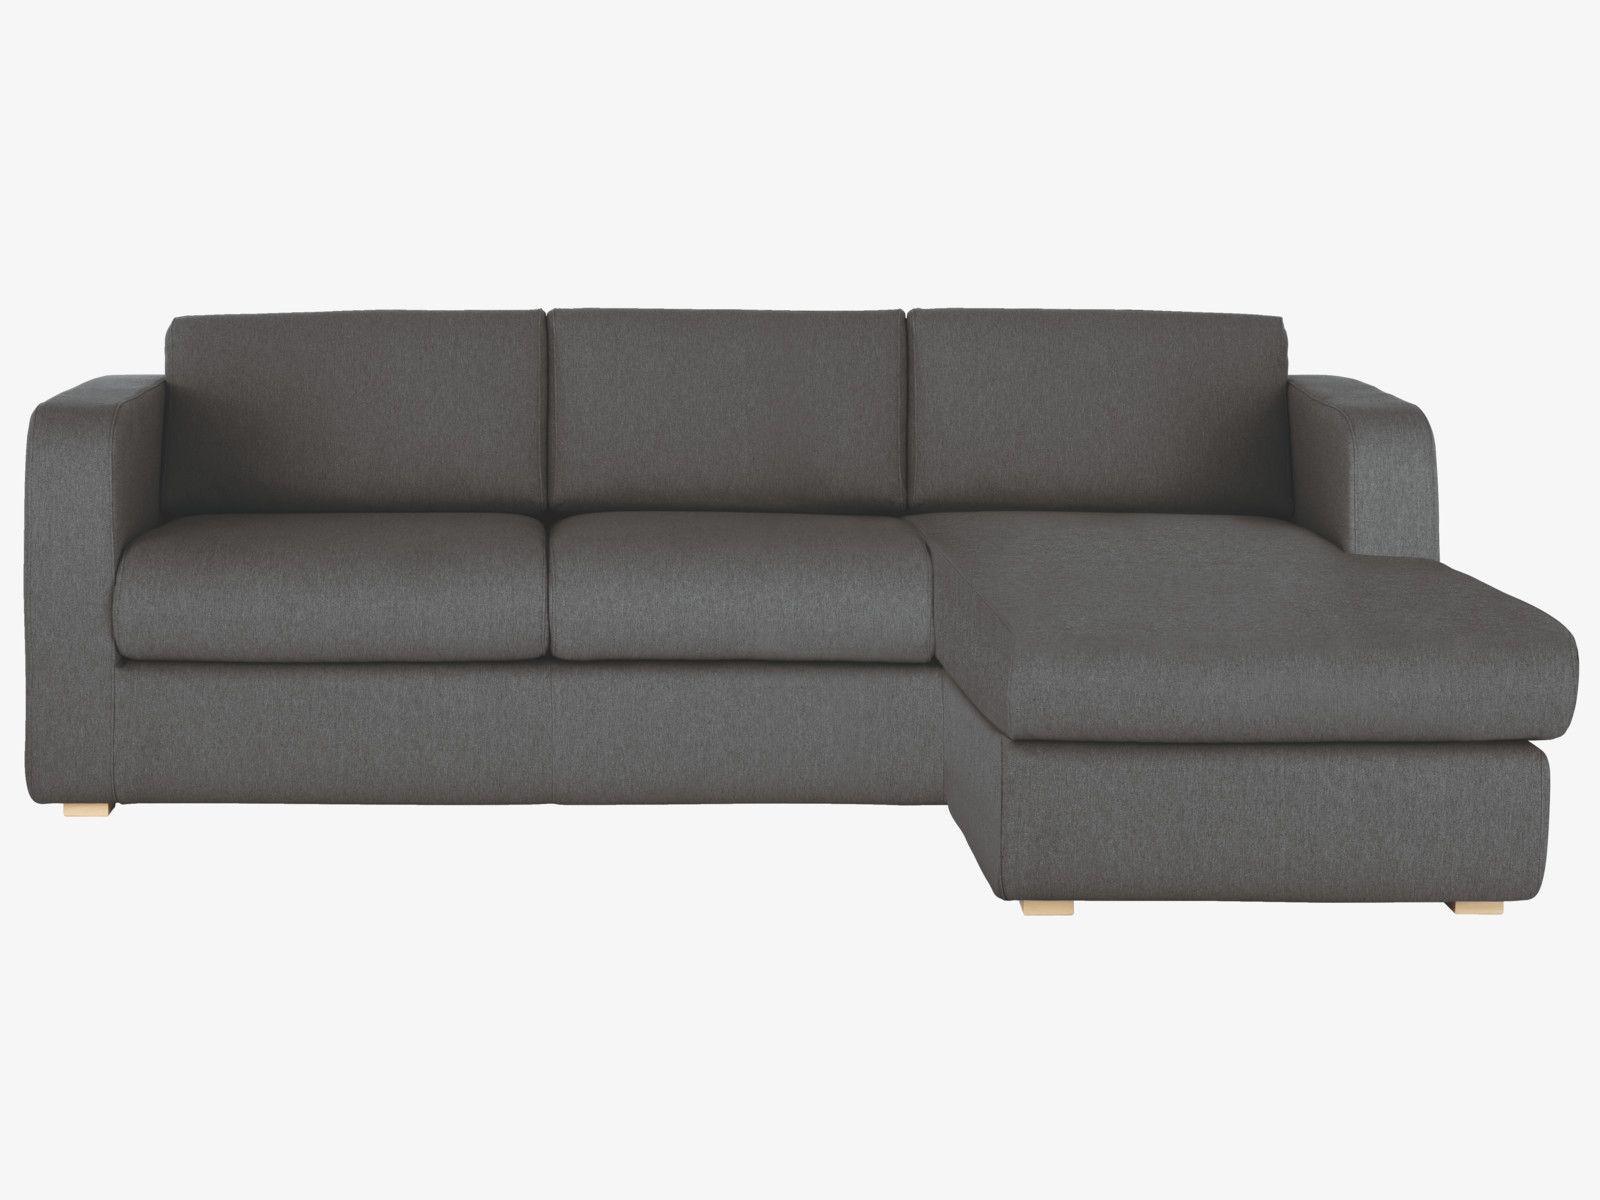 Porto Charcoal Fabric Reversible Chaise Sofa Chaise Sofa Sofa